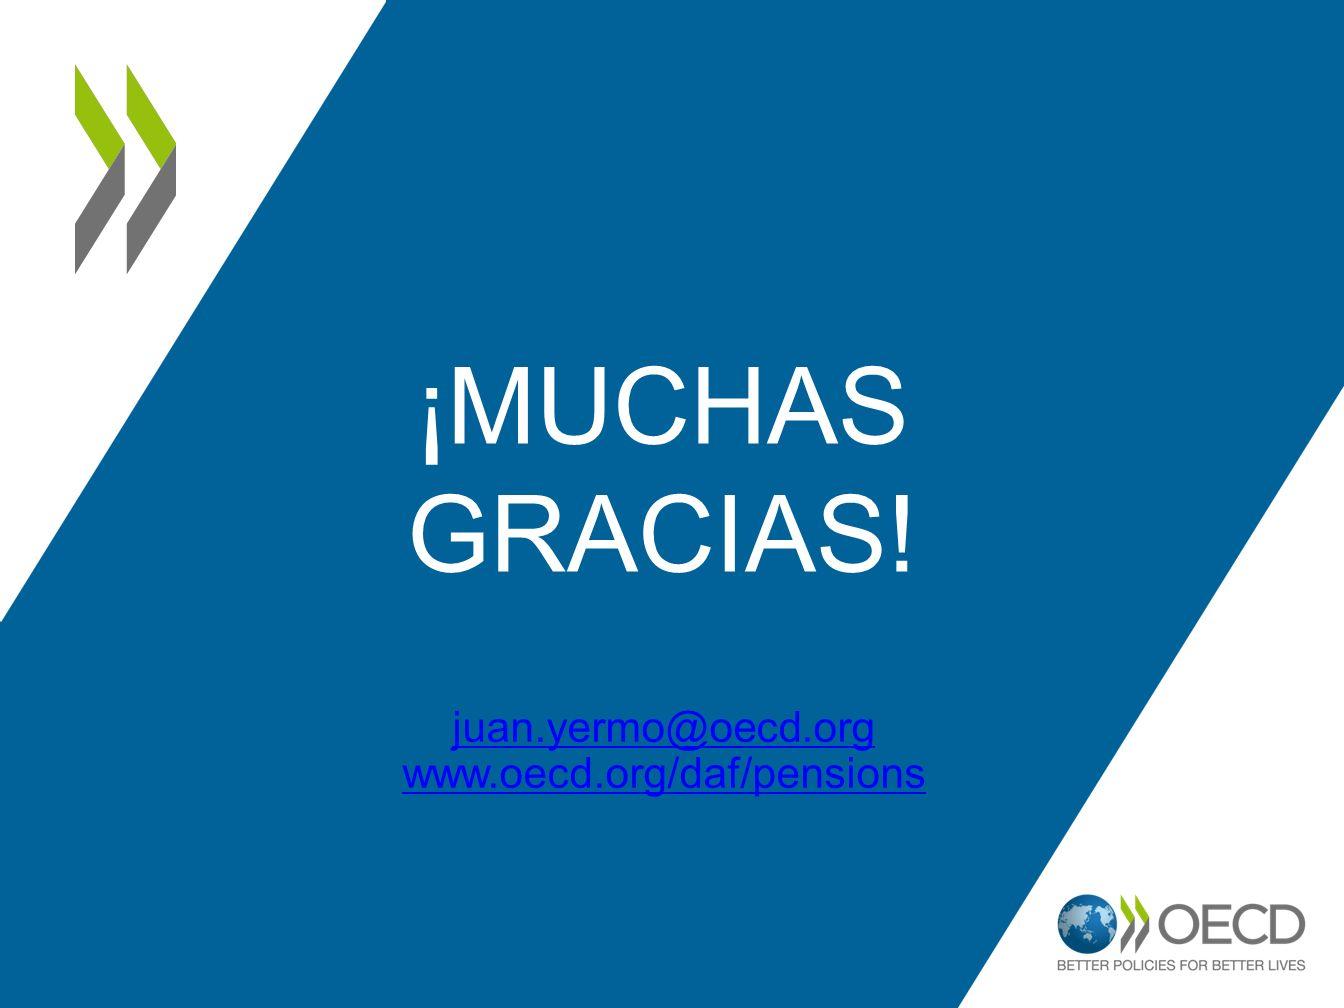 juan.yermo@oecd.org www.oecd.org/daf/pensions